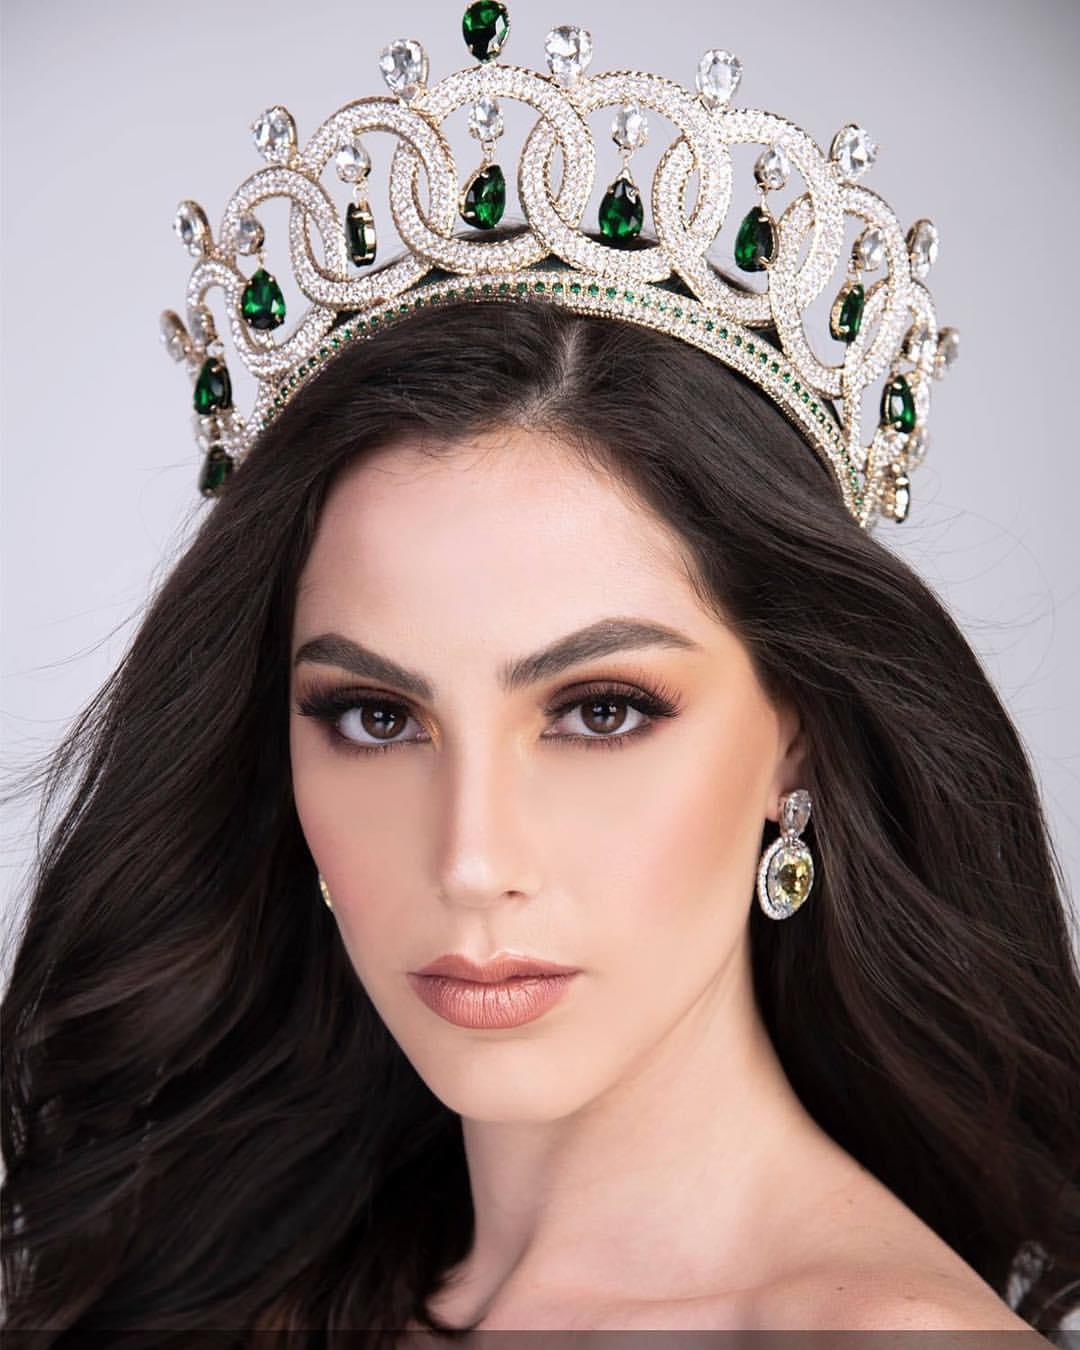 maria malo, 1st runner-up de miss grand international 2019. - Página 2 65565110